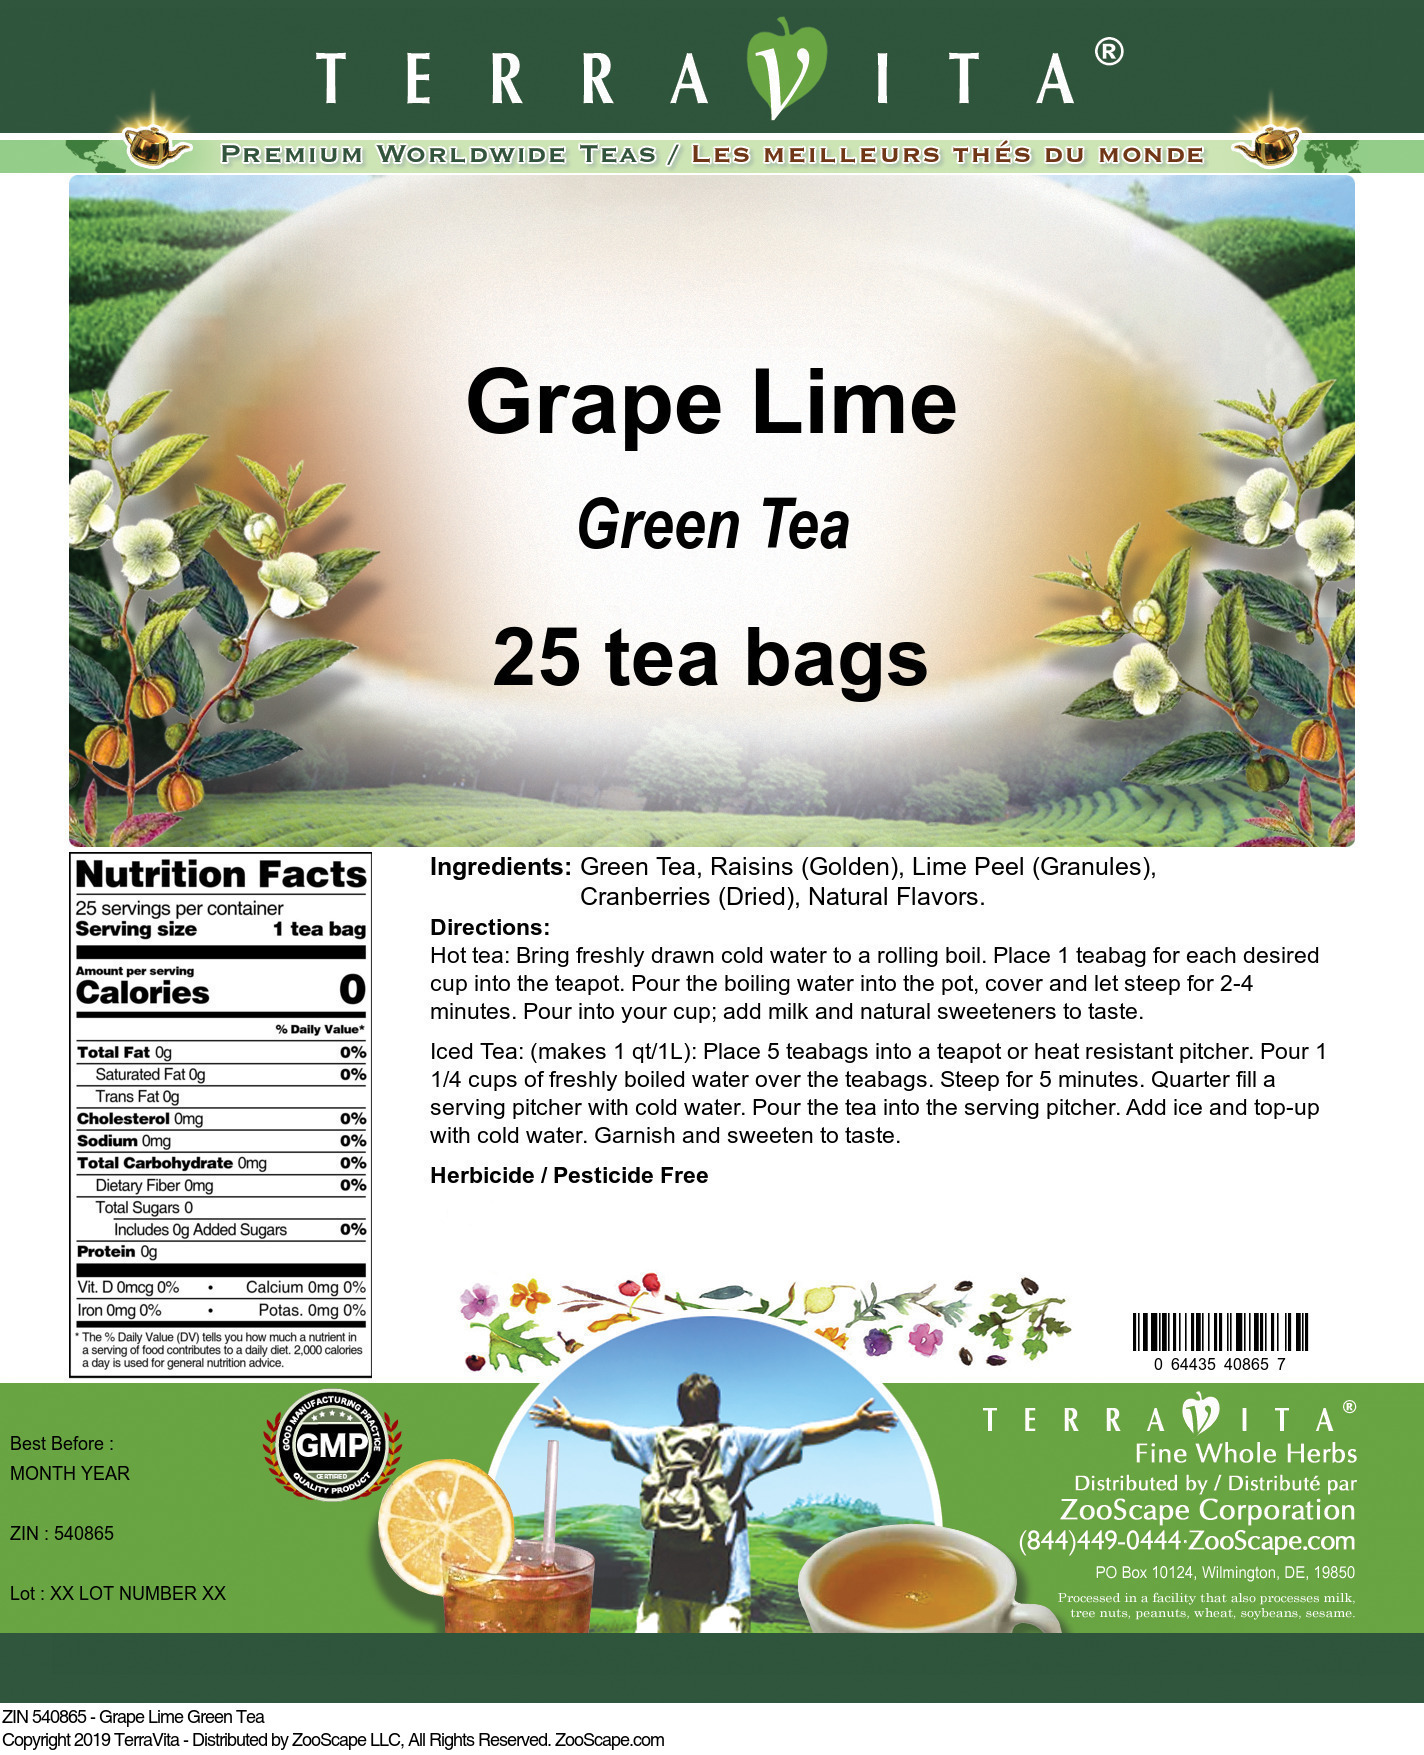 Grape Lime Green Tea